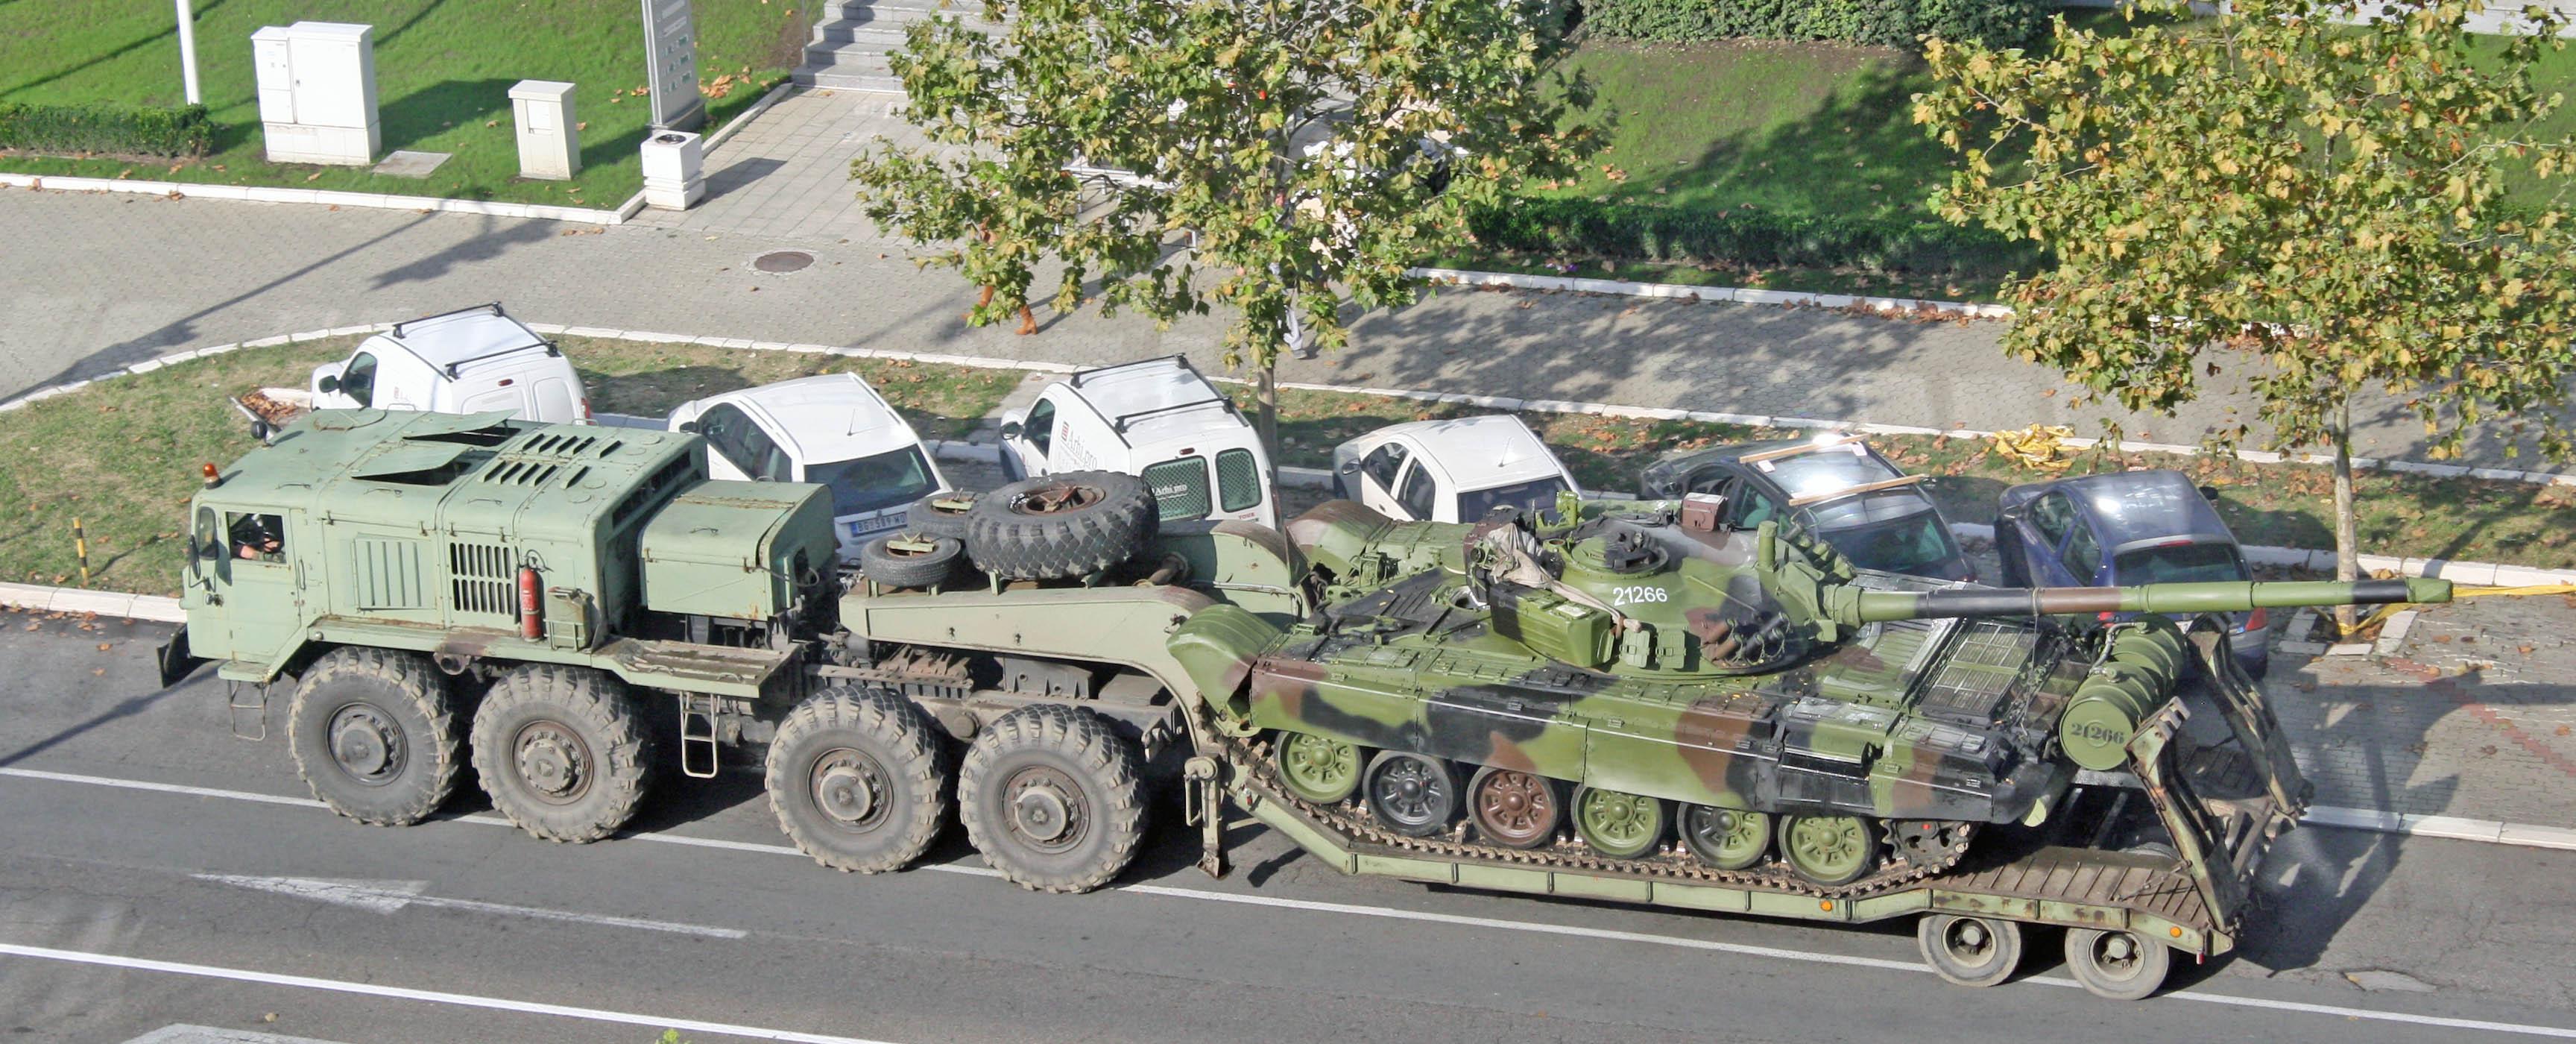 МАЗ-537 транспортирует танк по дороге